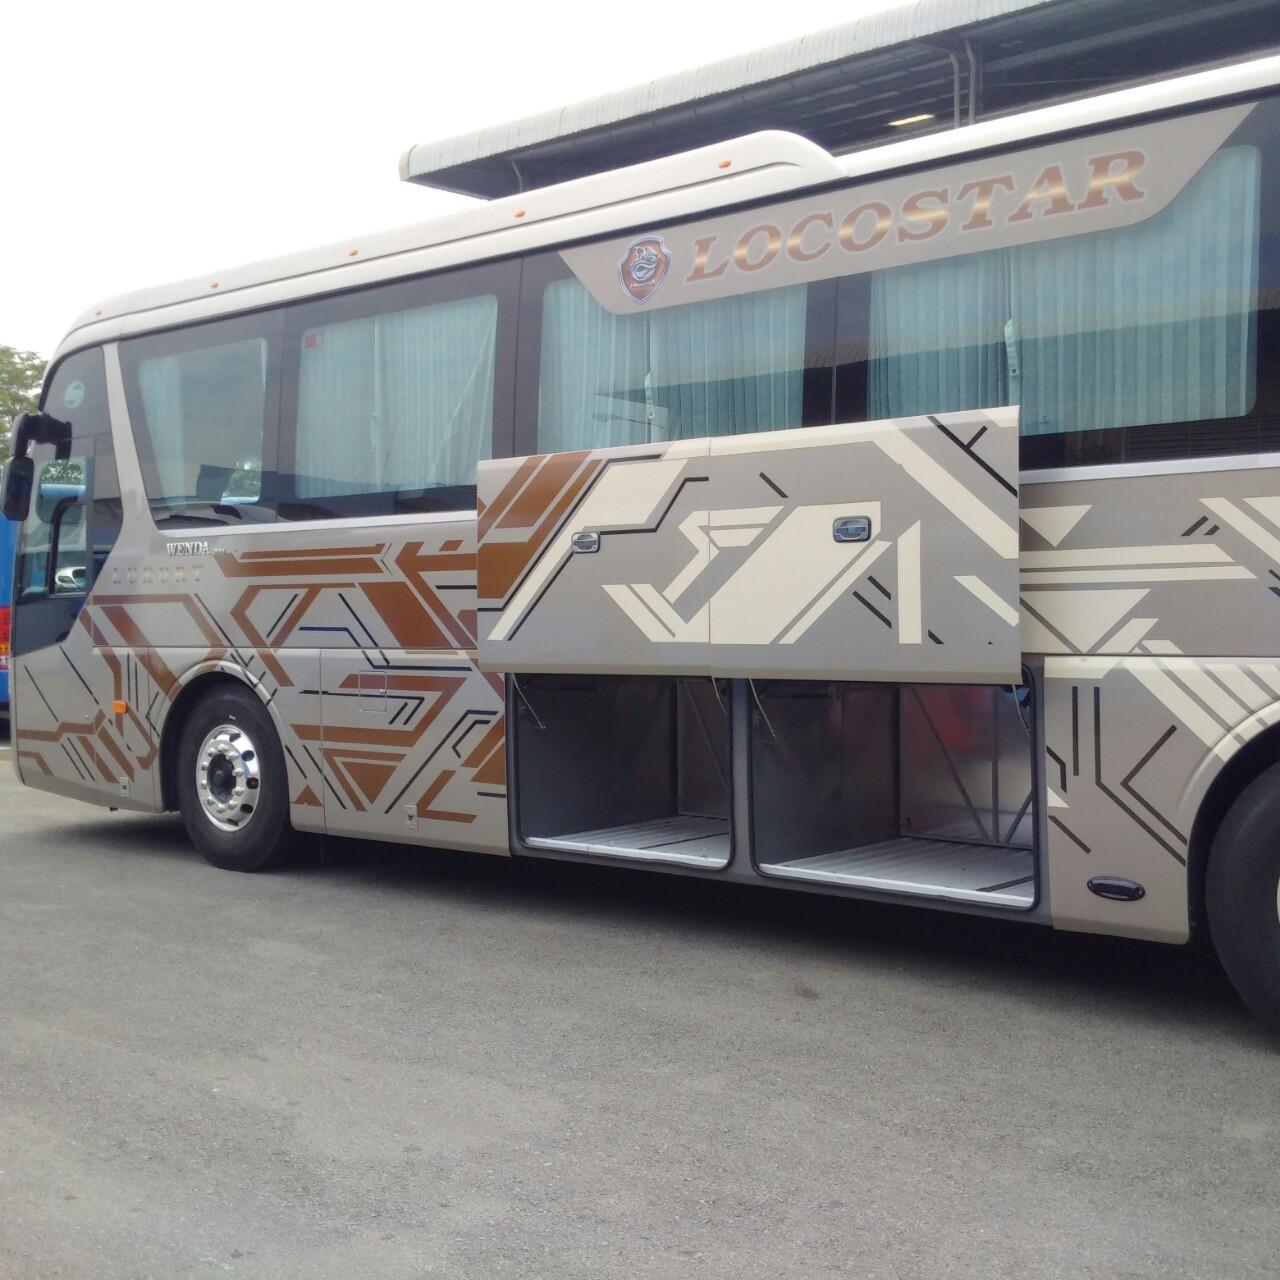 xe-khach-samco-vip-32-cho-ghe-nga-10